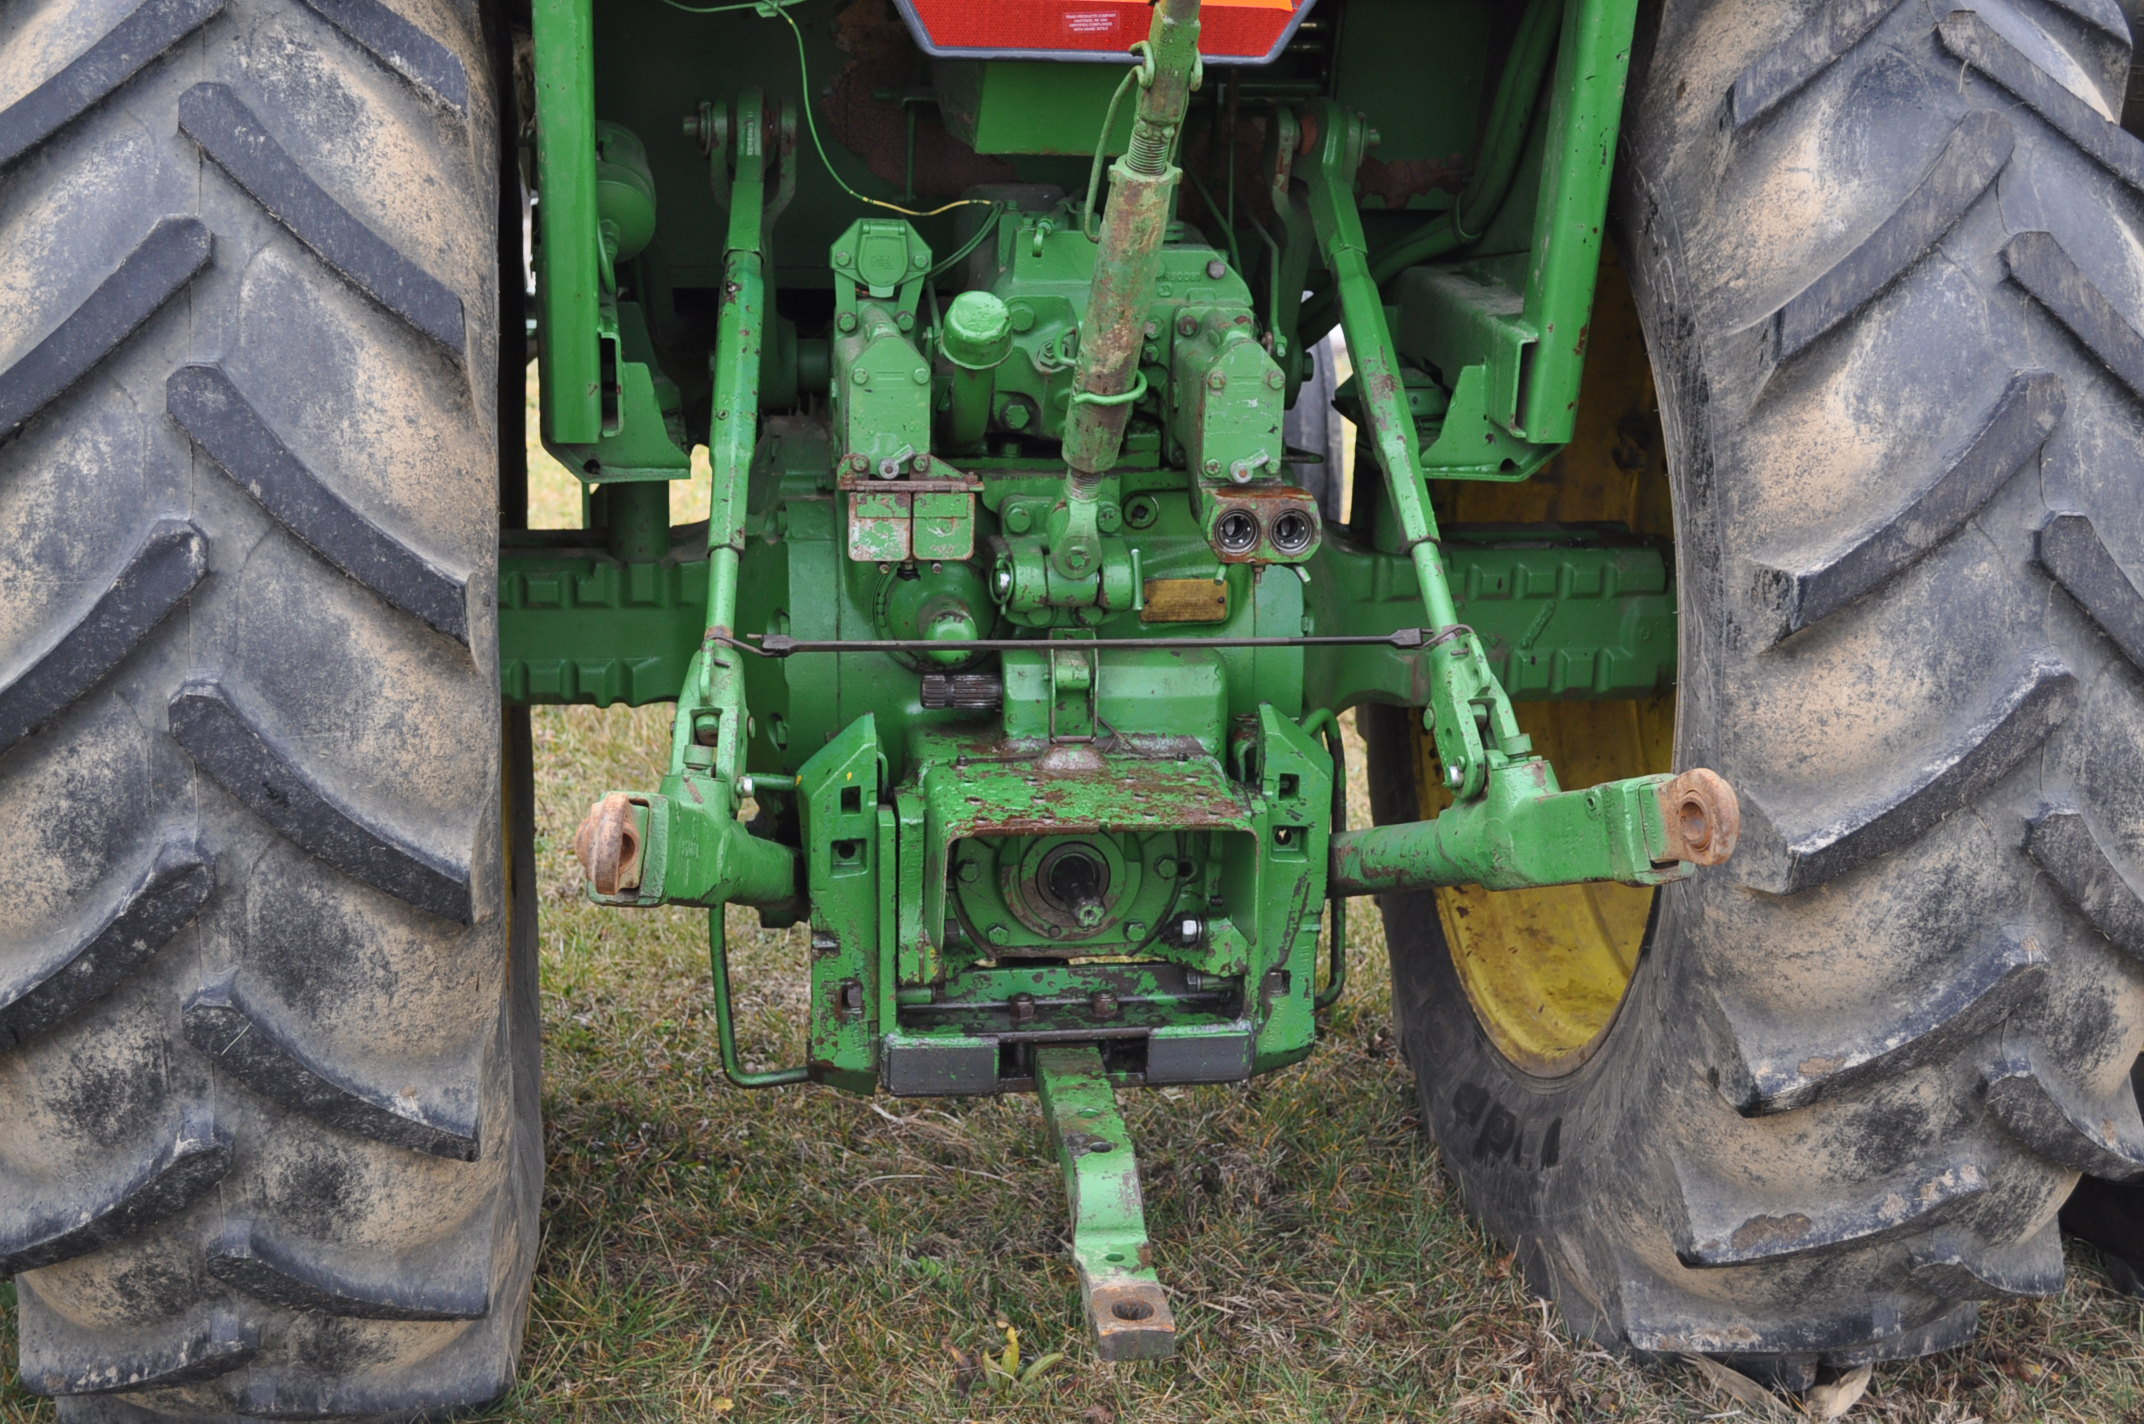 John Deere 4430 tractor, diesel, 18.4-34 hub duals, 10.00-16 front, CHA, Quad range, 2 hyd - Image 11 of 20